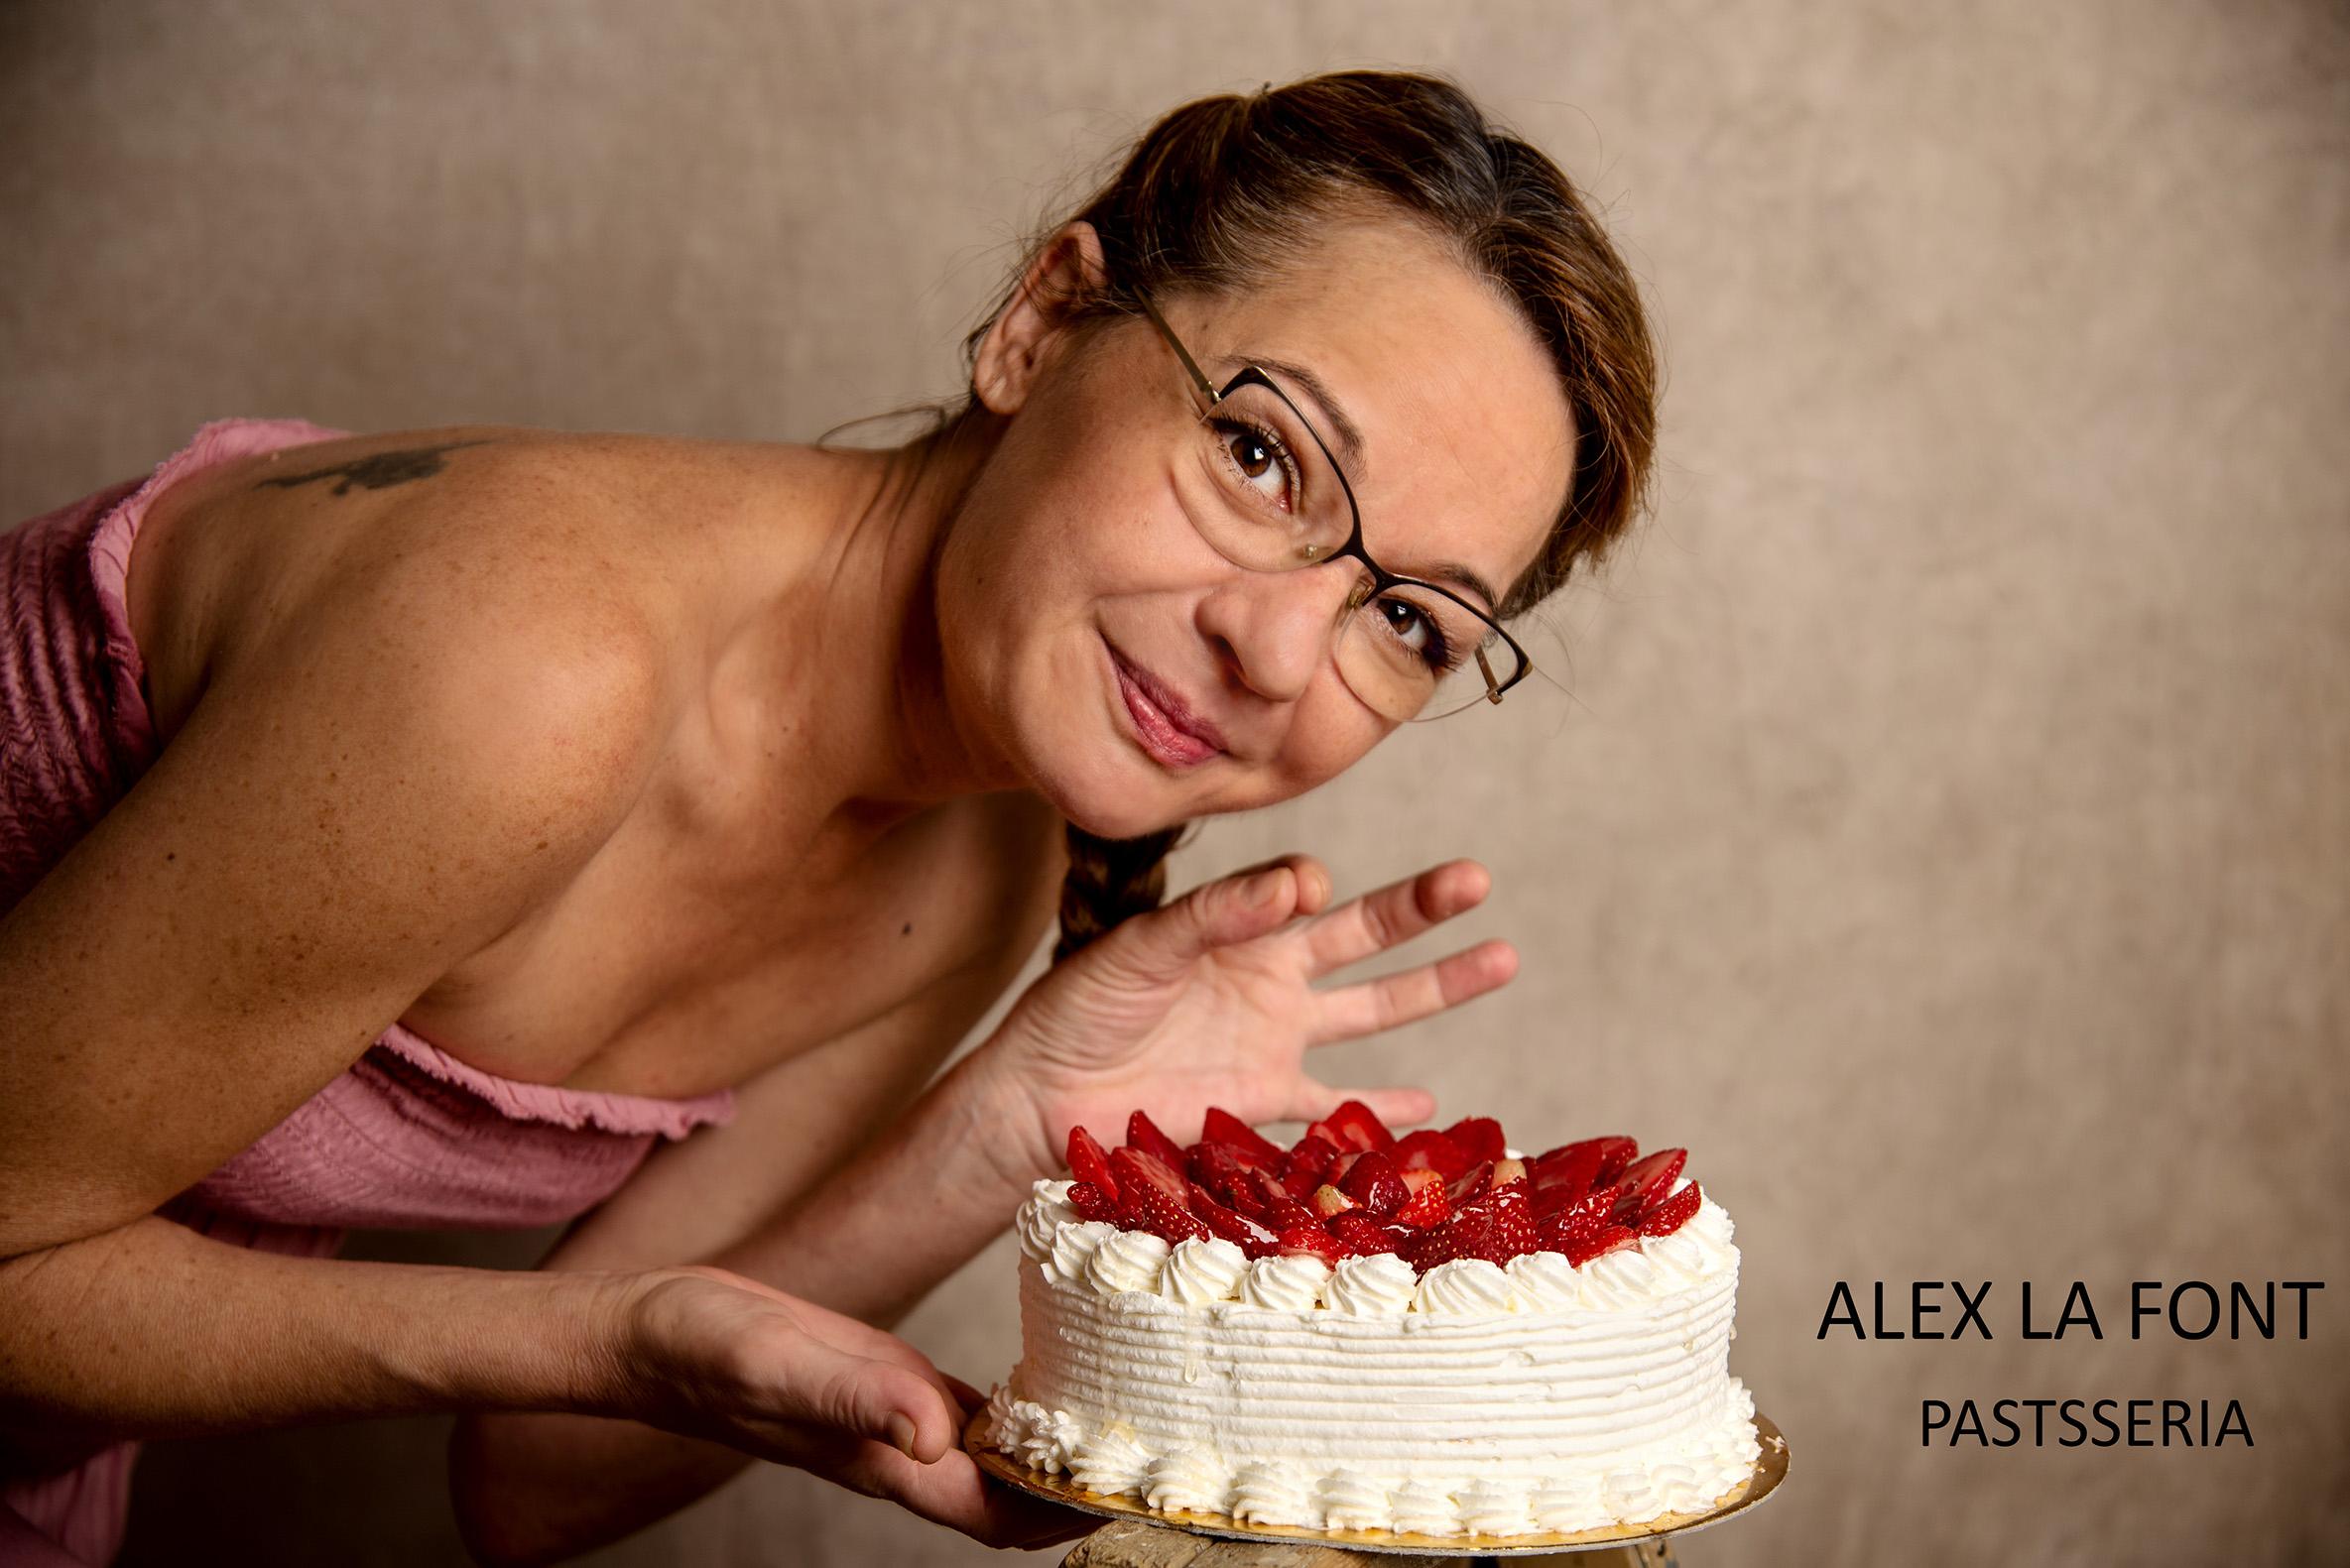 Alex La Font: Pastisseria